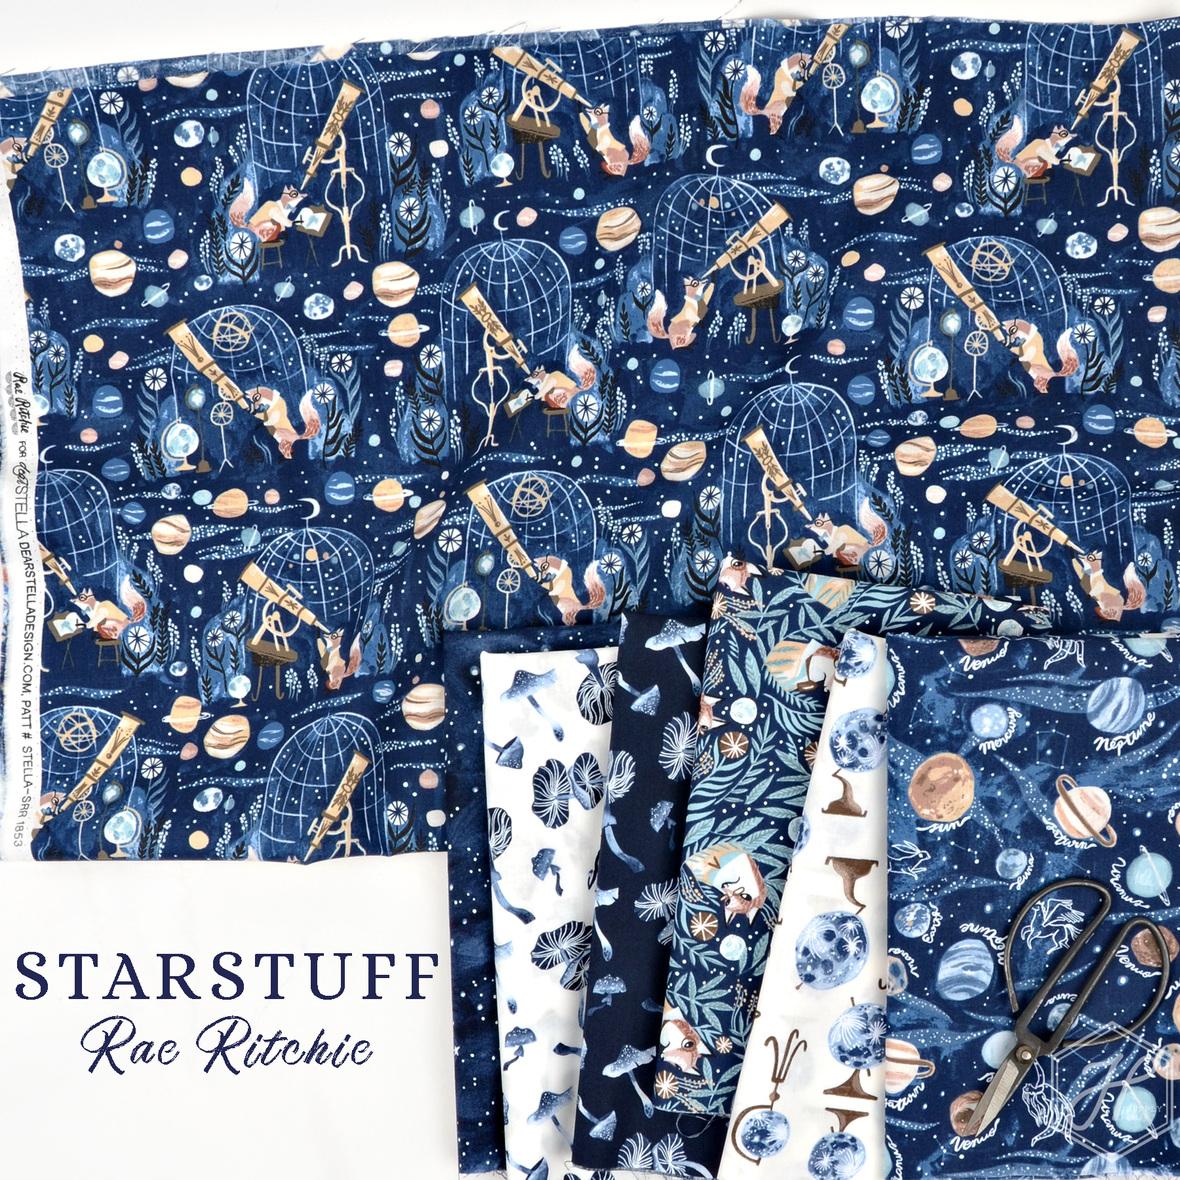 Starstuff-Rae-Ritchie-for-Dear-Stella-at-Hawthorne-Supply-Co